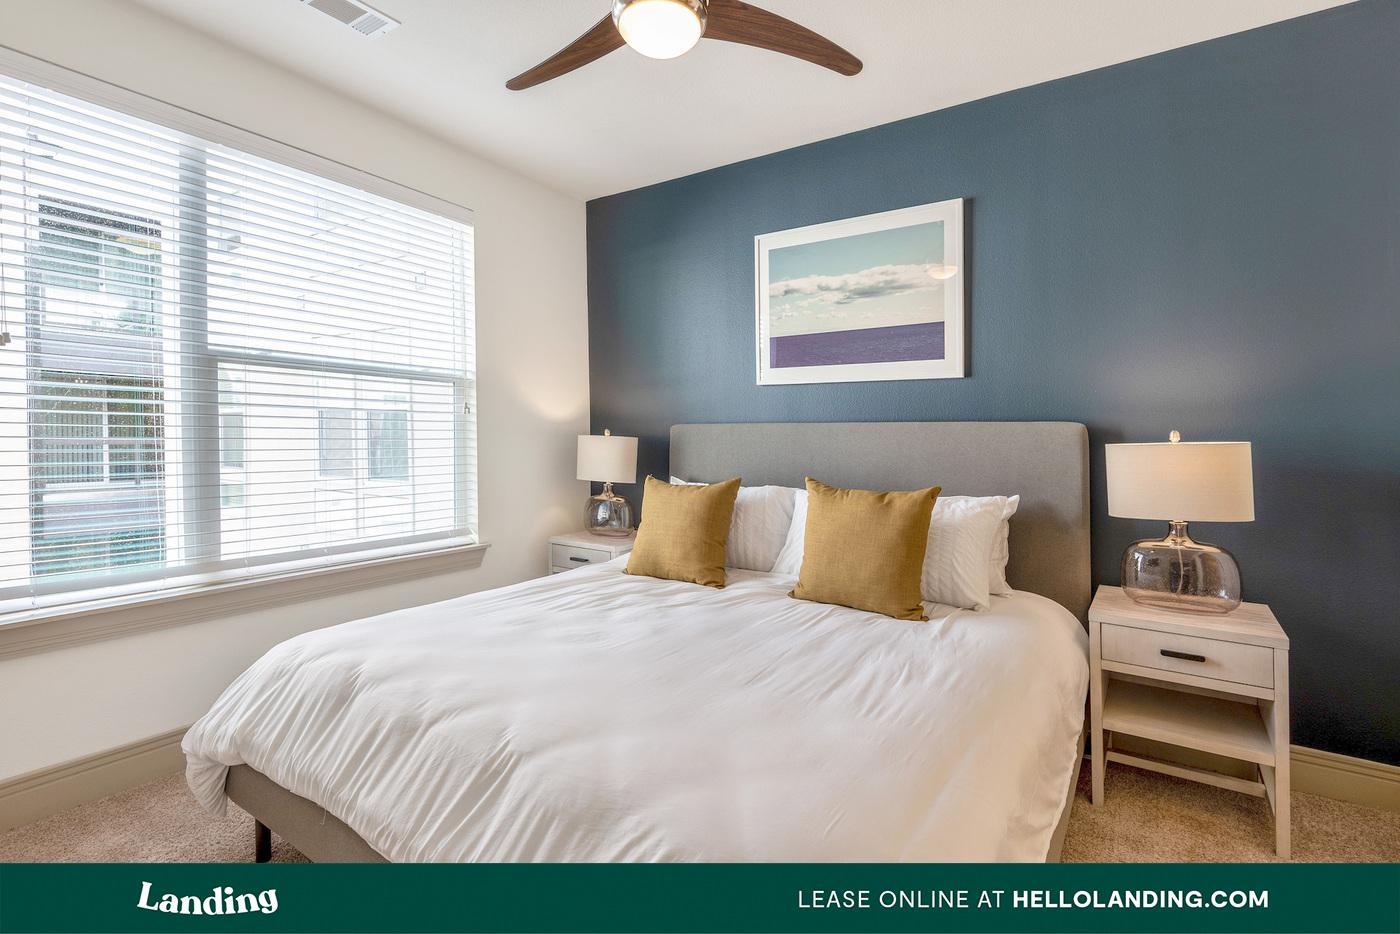 Savannah Oaks 04474 for rent